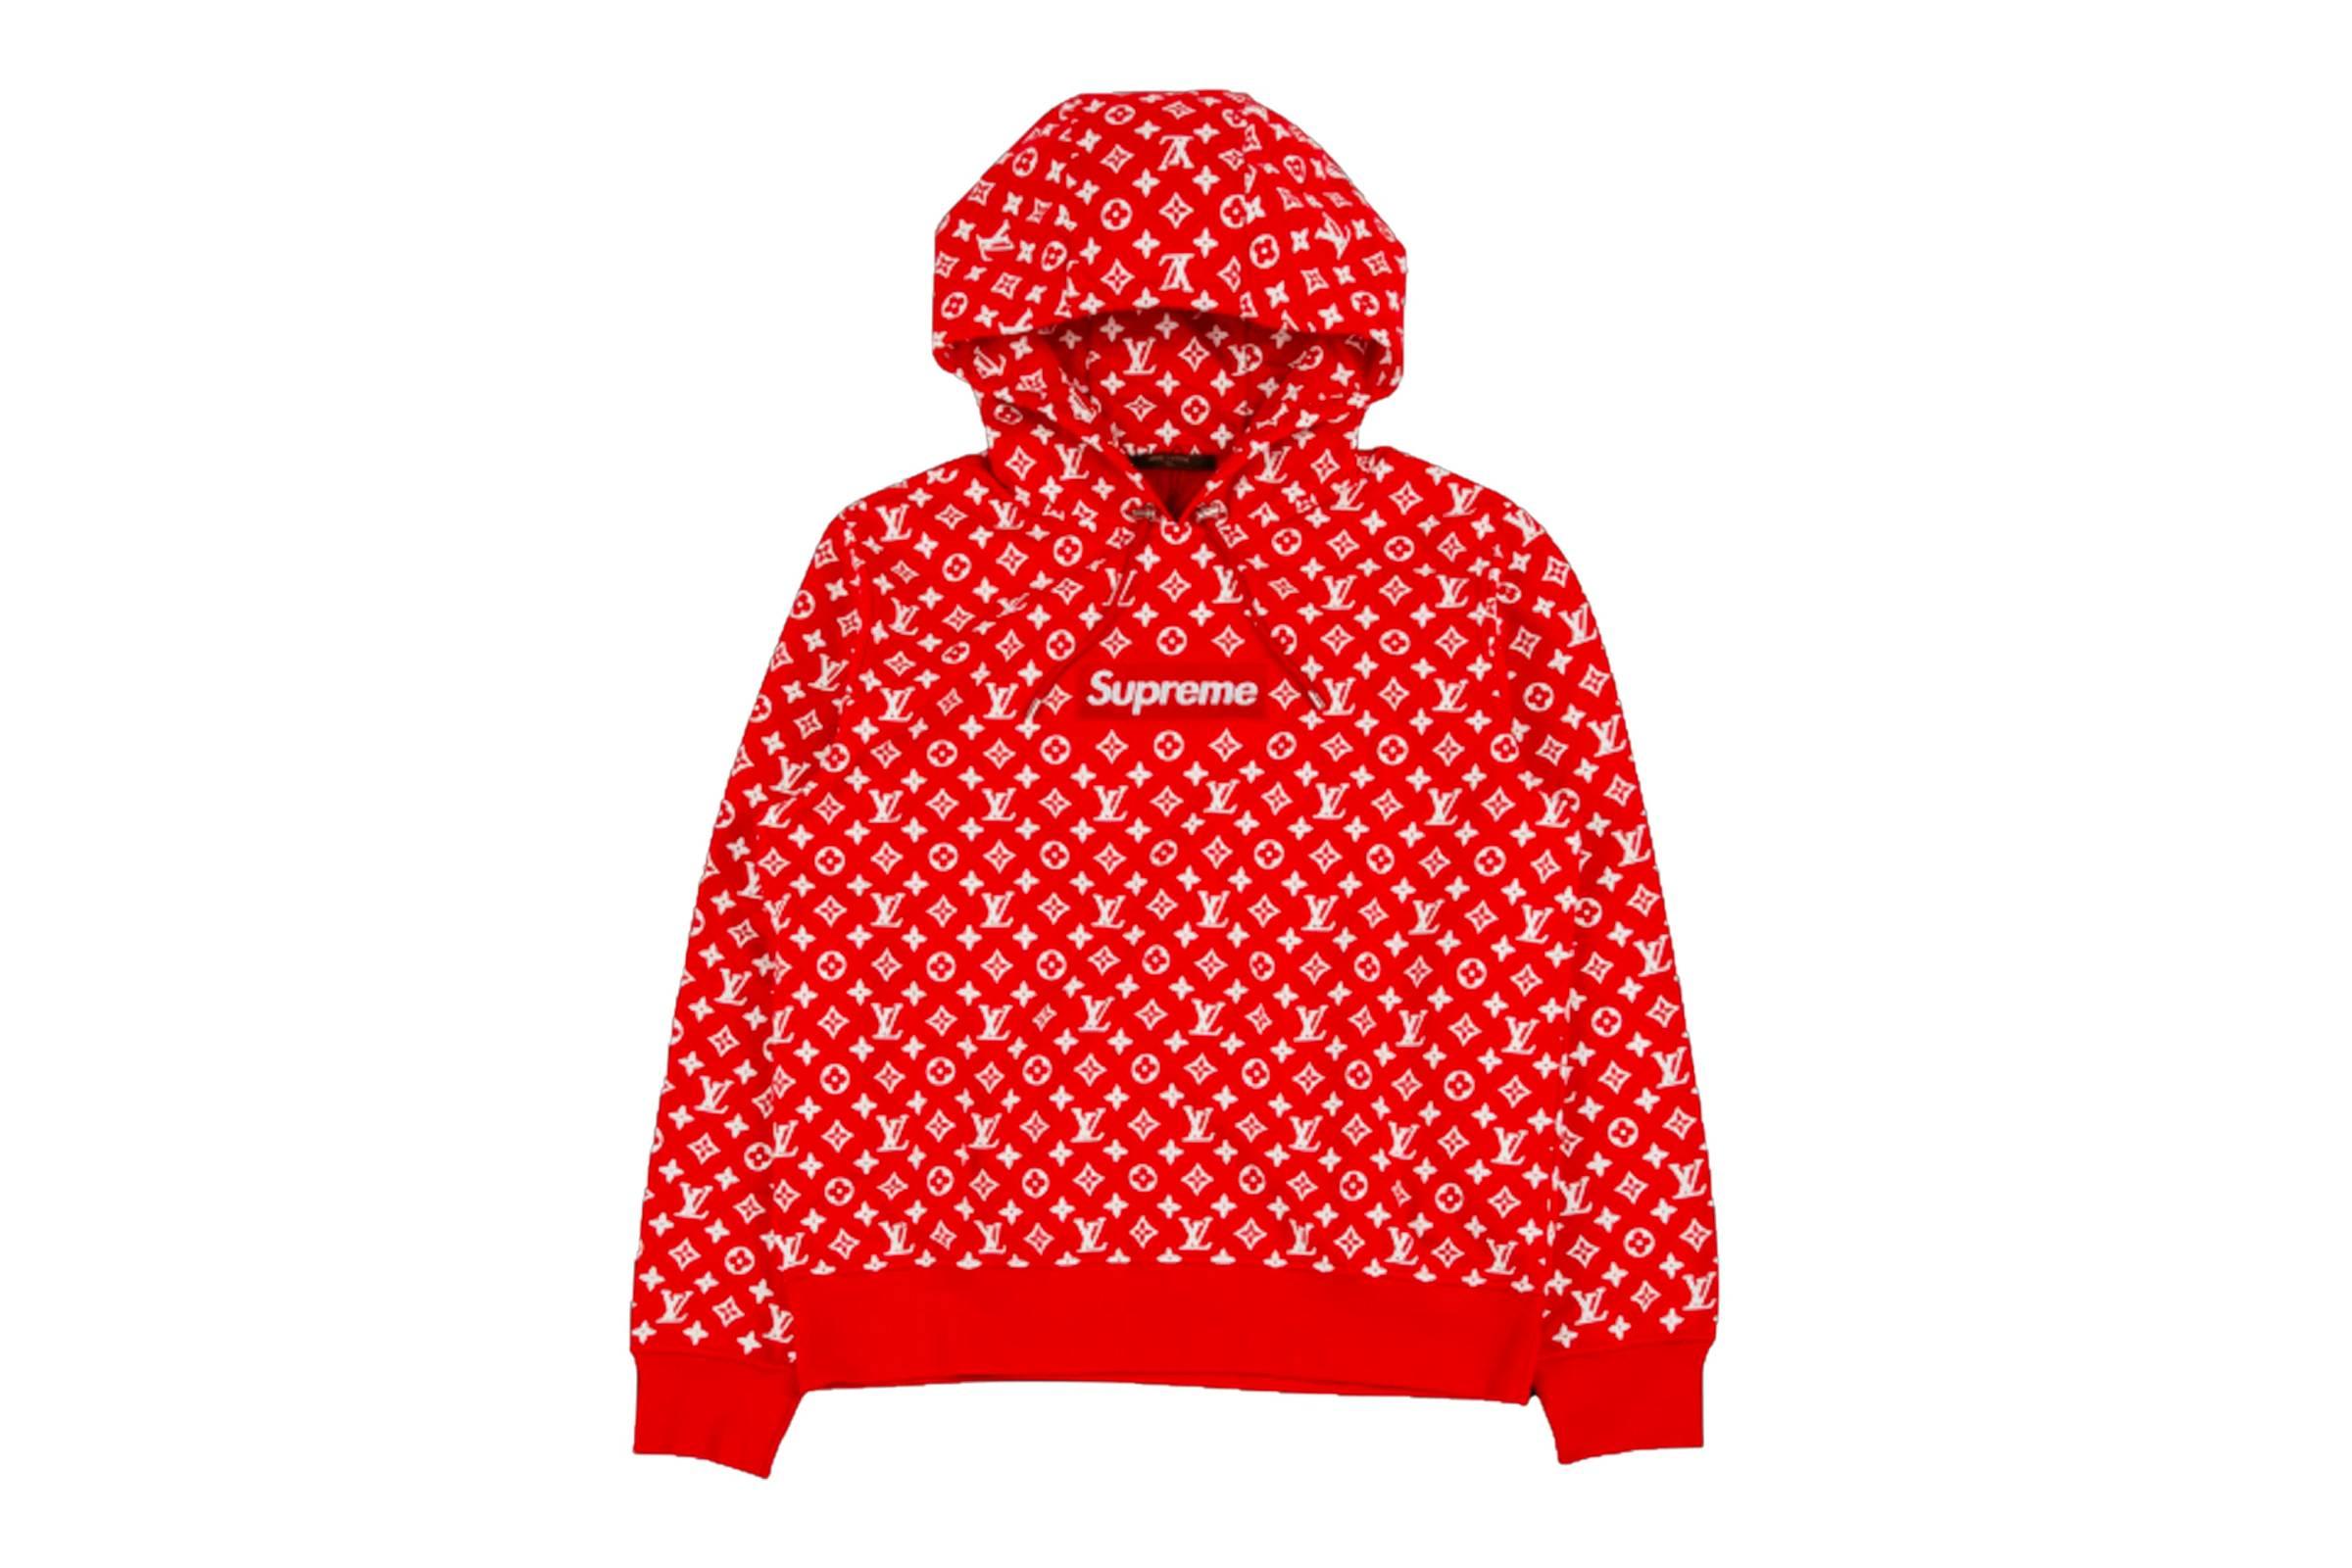 3. Supreme x Louis Vuitton Red Monogram Print Box Logo Hoodie